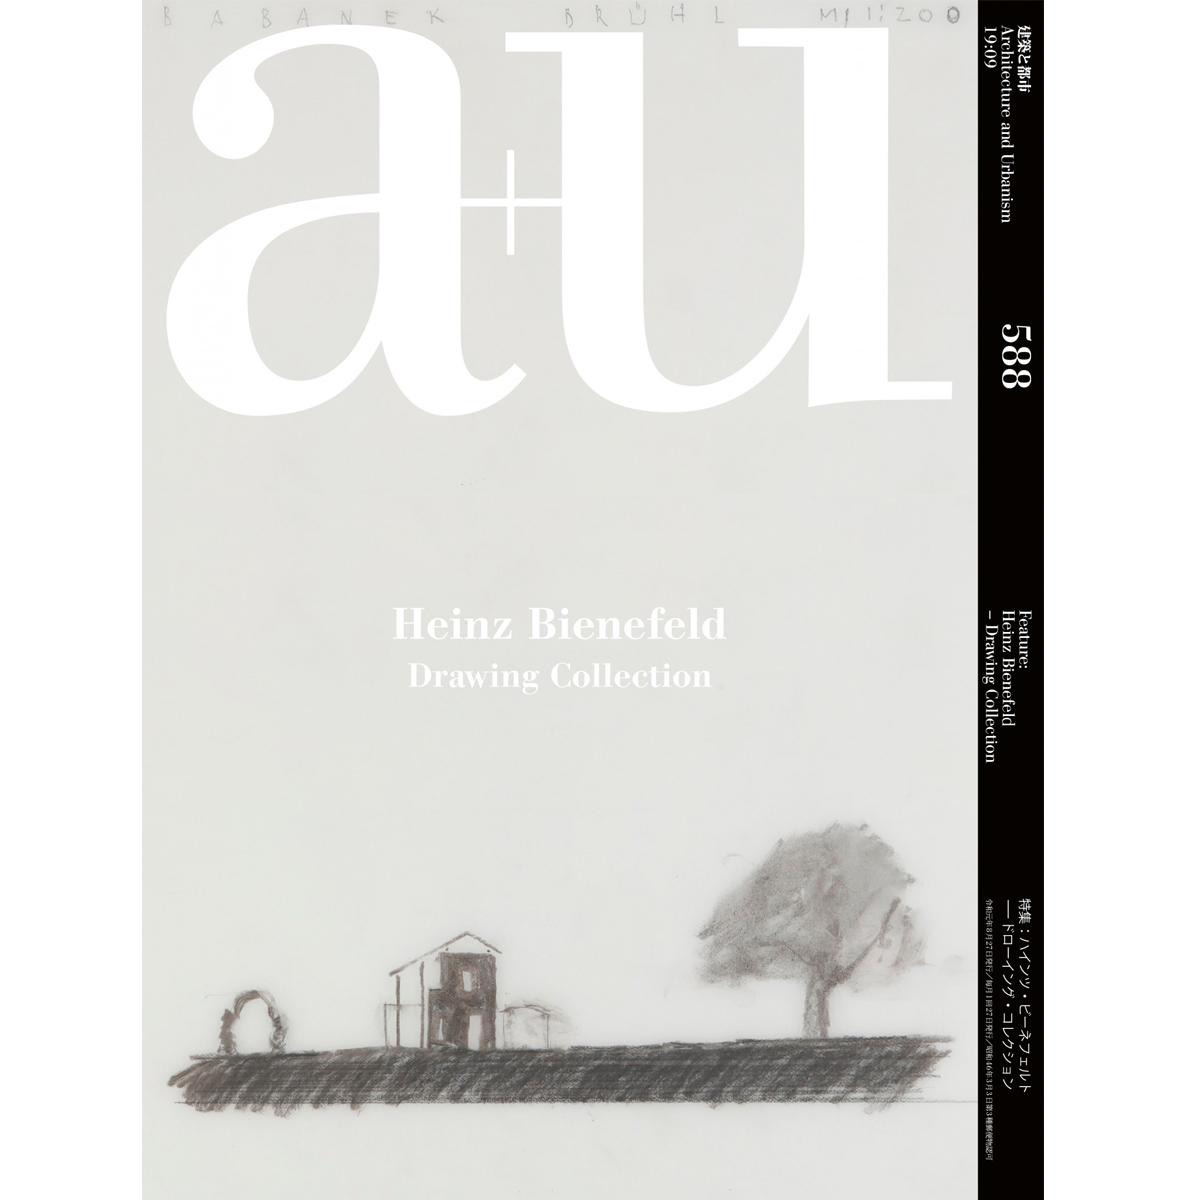 a+u: Heinz Bienefeld